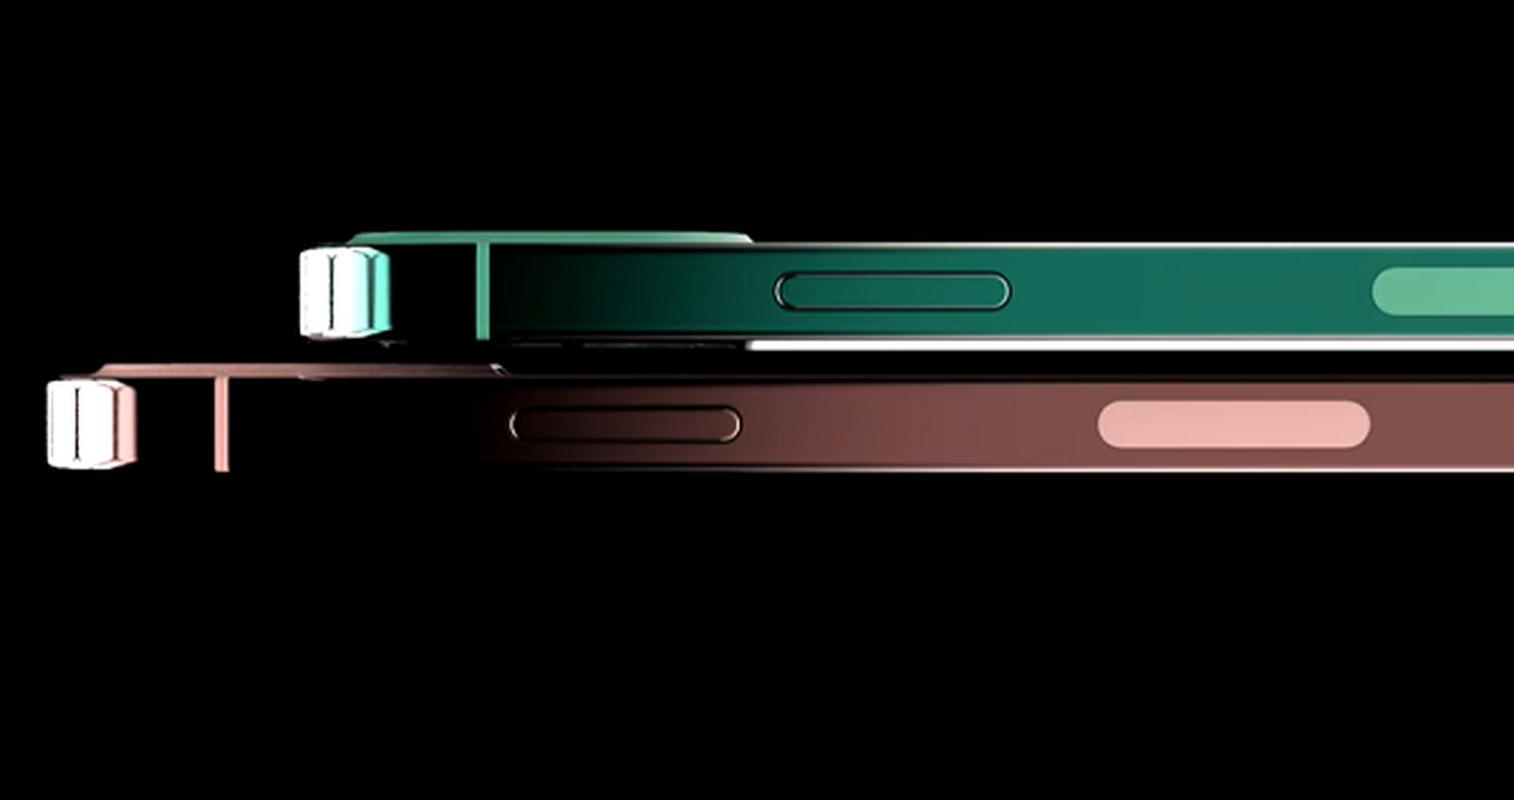 Lo dien be ngoai dep nhu tranh cua iPhone 13 Promax... tin don-Hinh-7